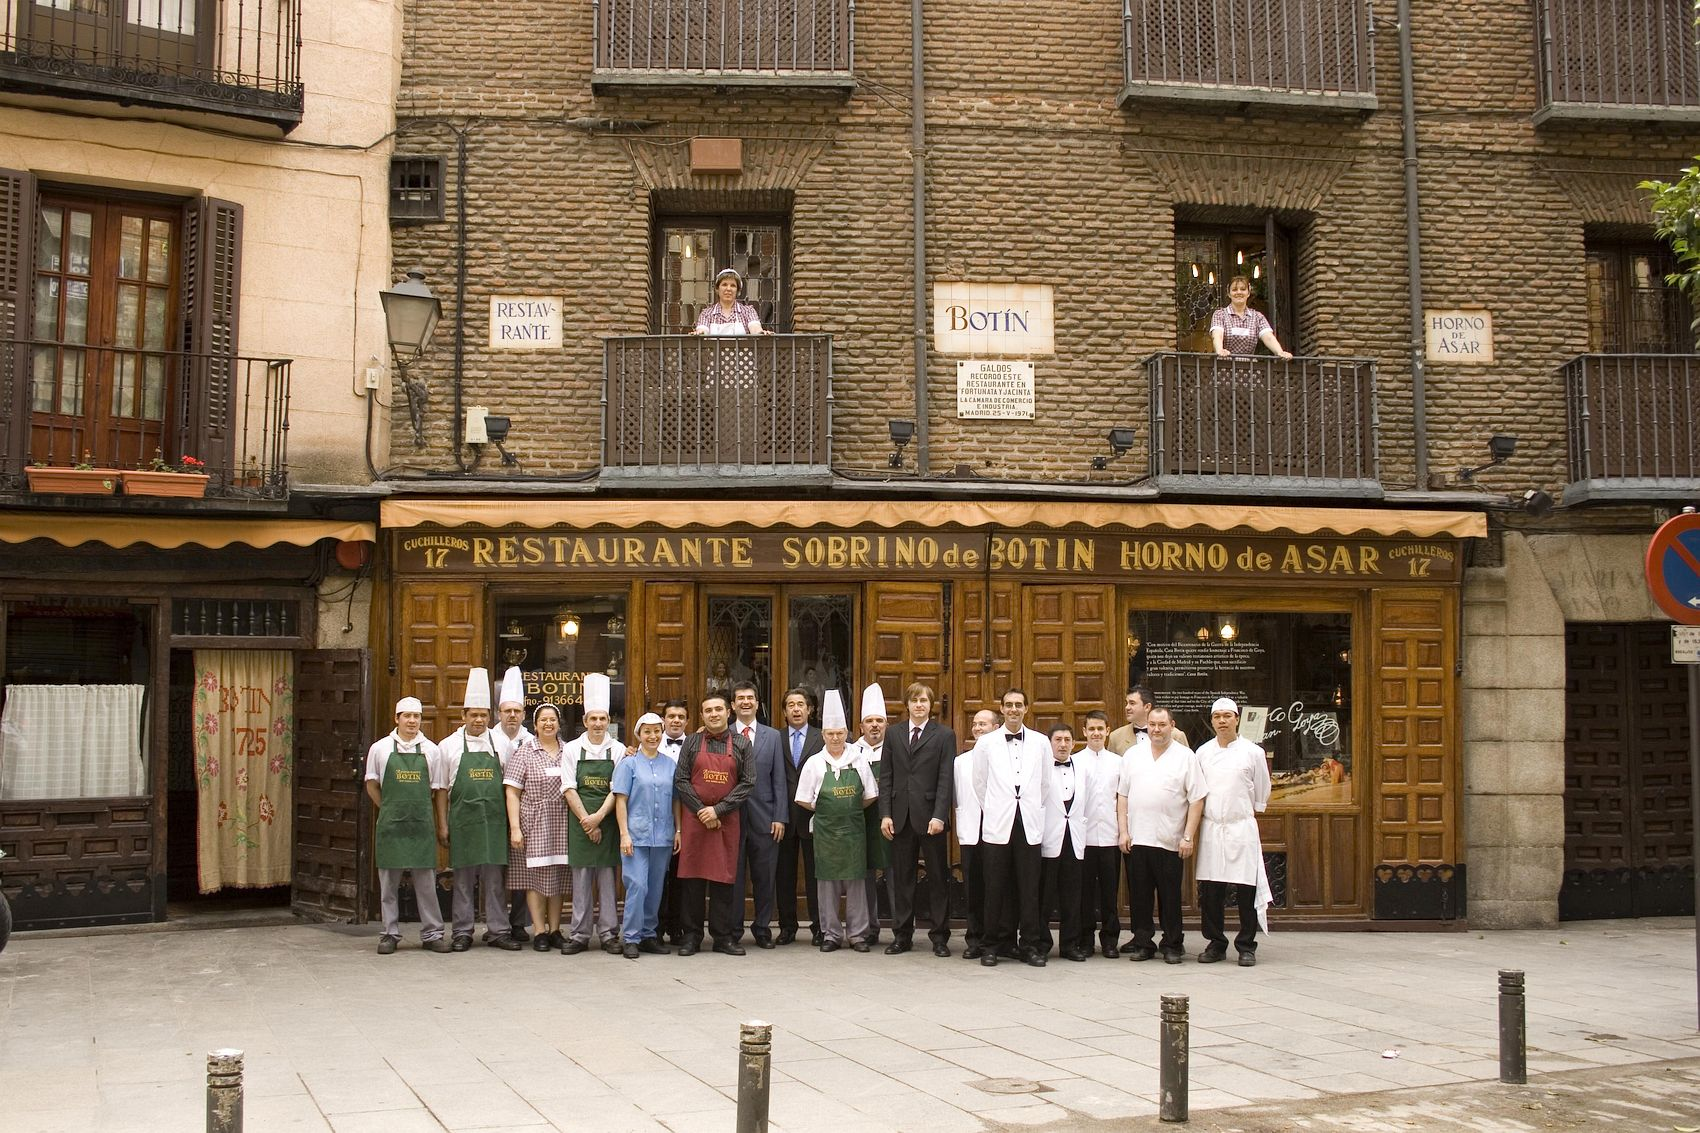 Oldest Restaurant in the World